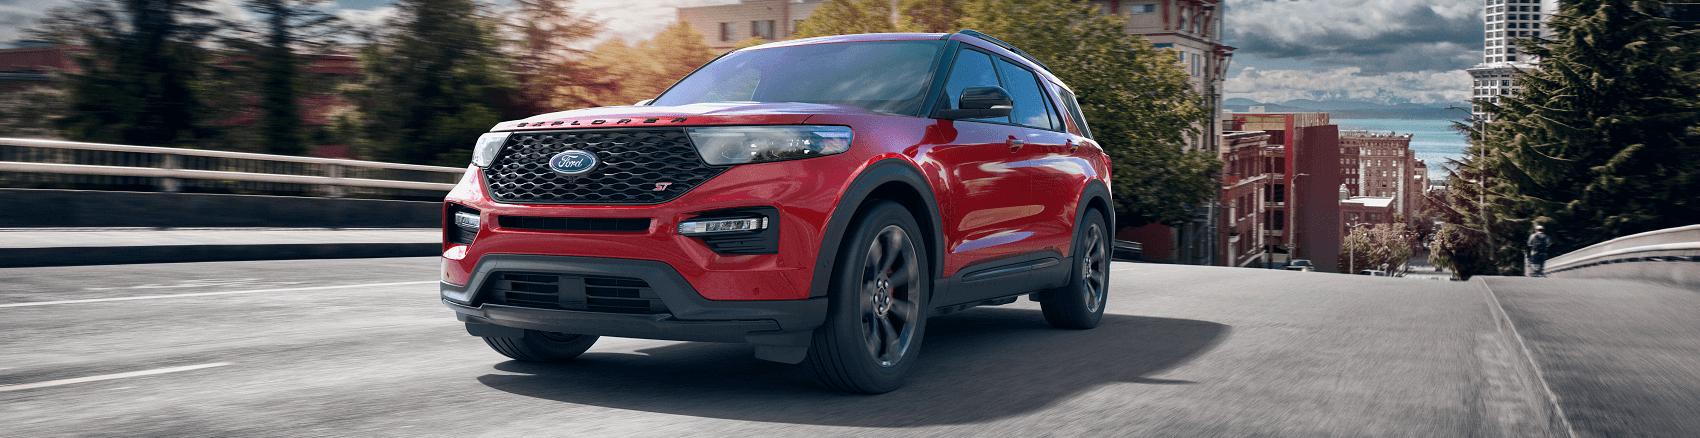 Ford Explorer Trim Levels